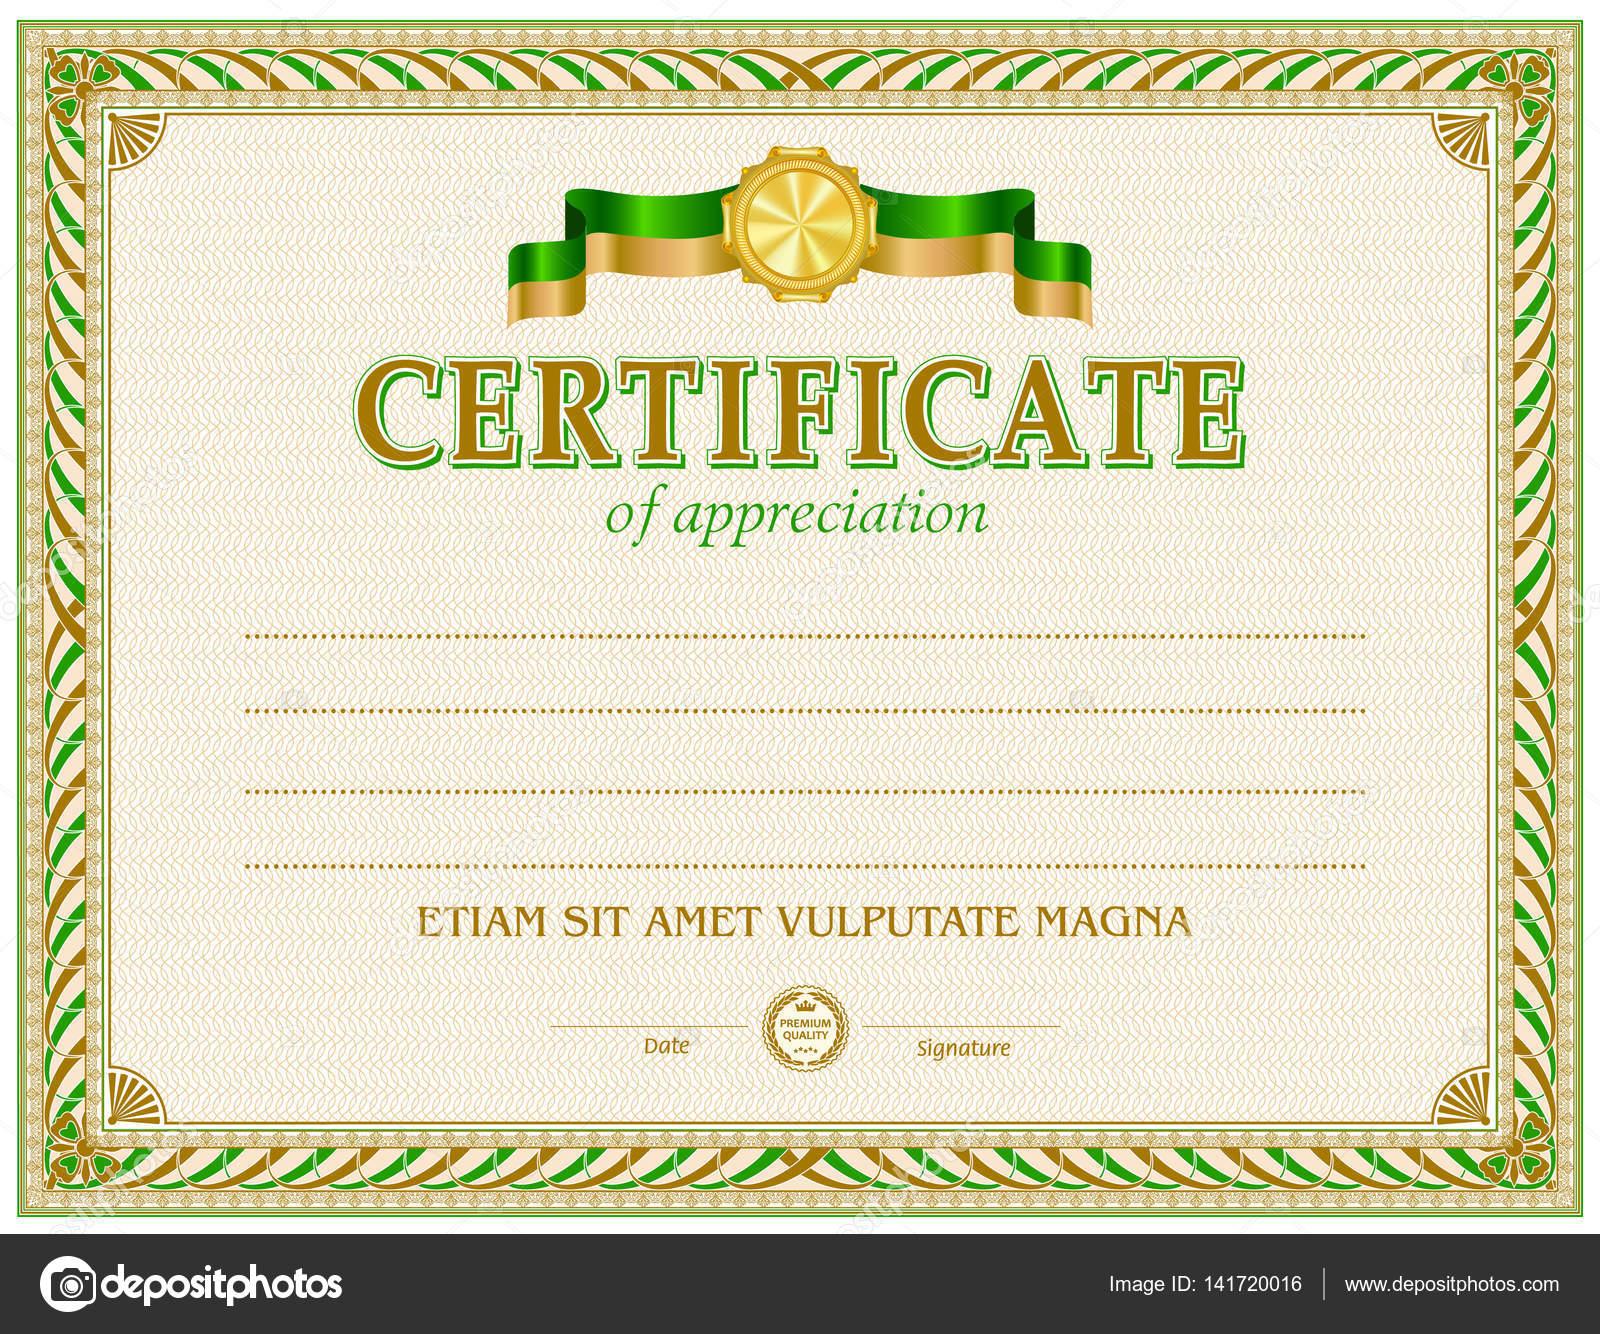 Zertifikat leere Vorlage — Stockvektor © tedgun #141720016